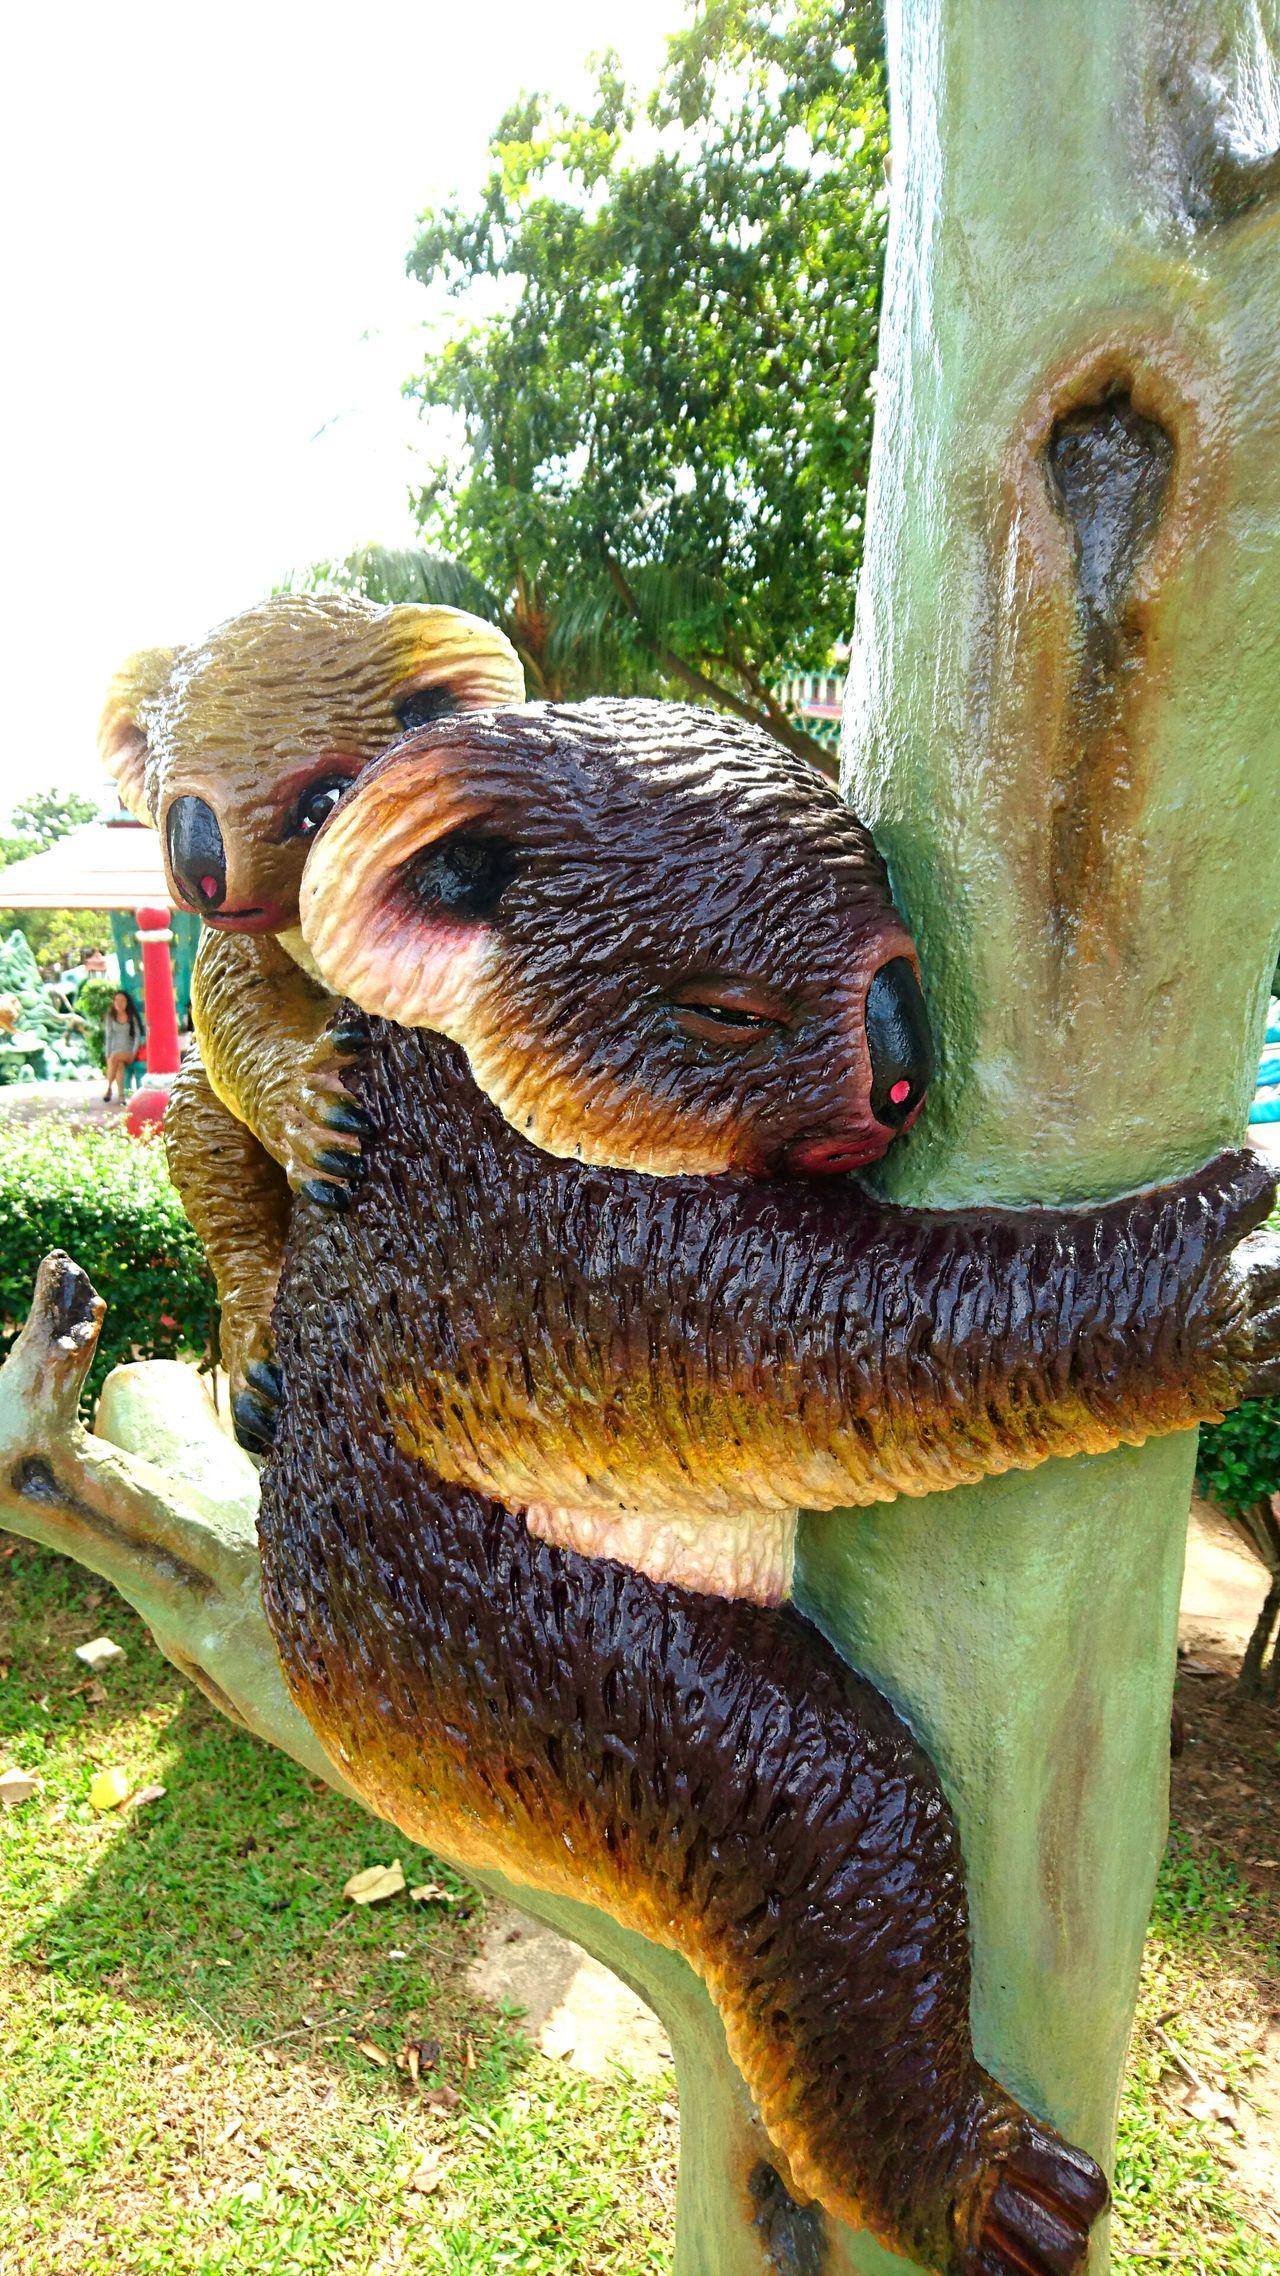 Bright Day Randomshot Singapore Hawparvilla Throwback Statue Koala Bear